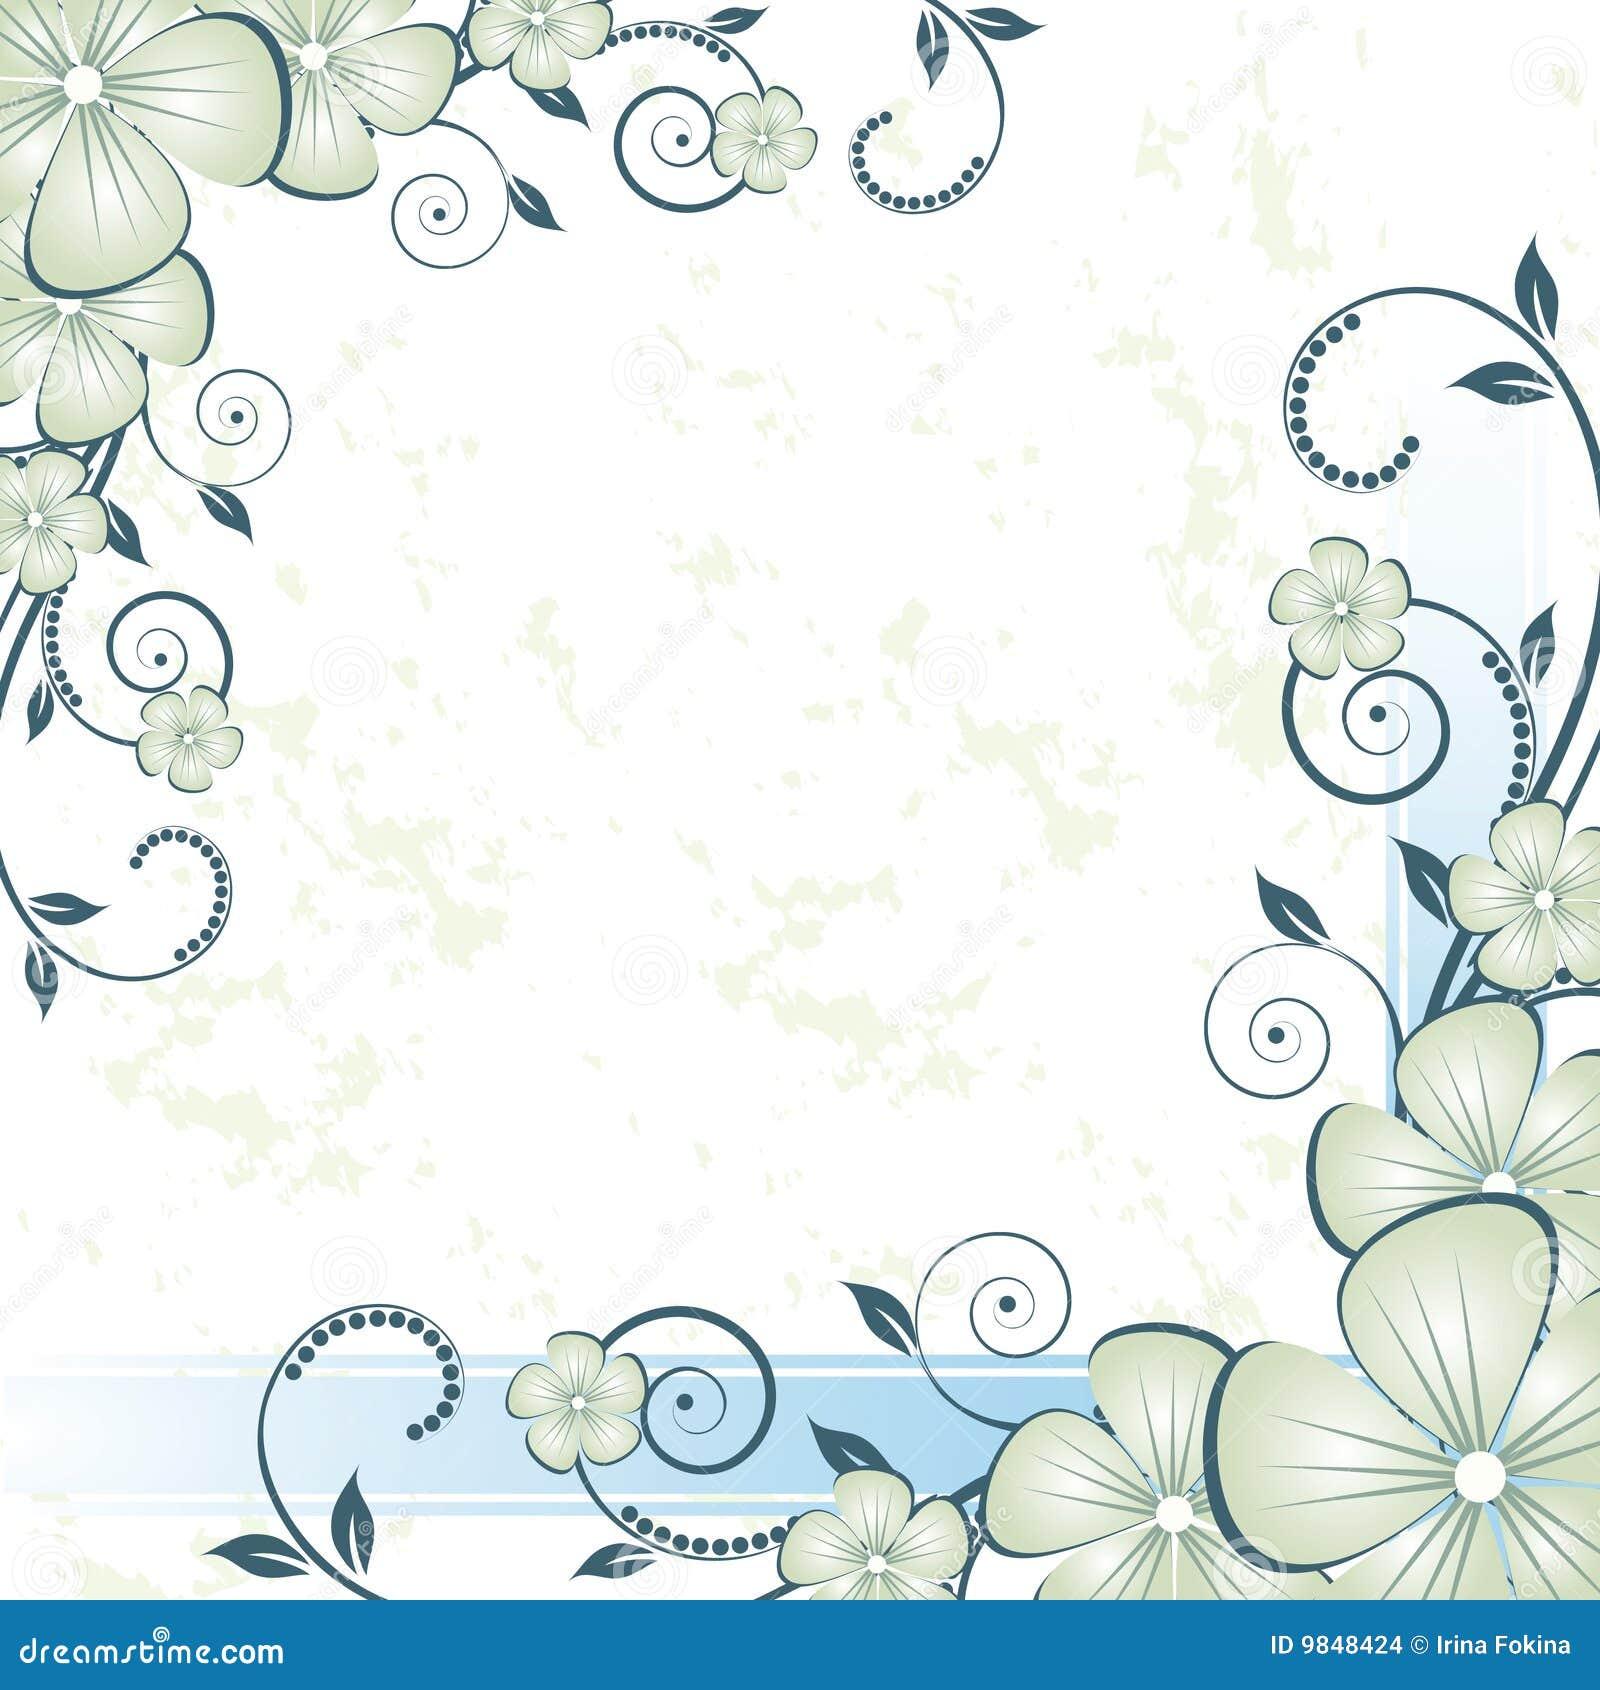 Nice Flower Grunge Background Stock Vector